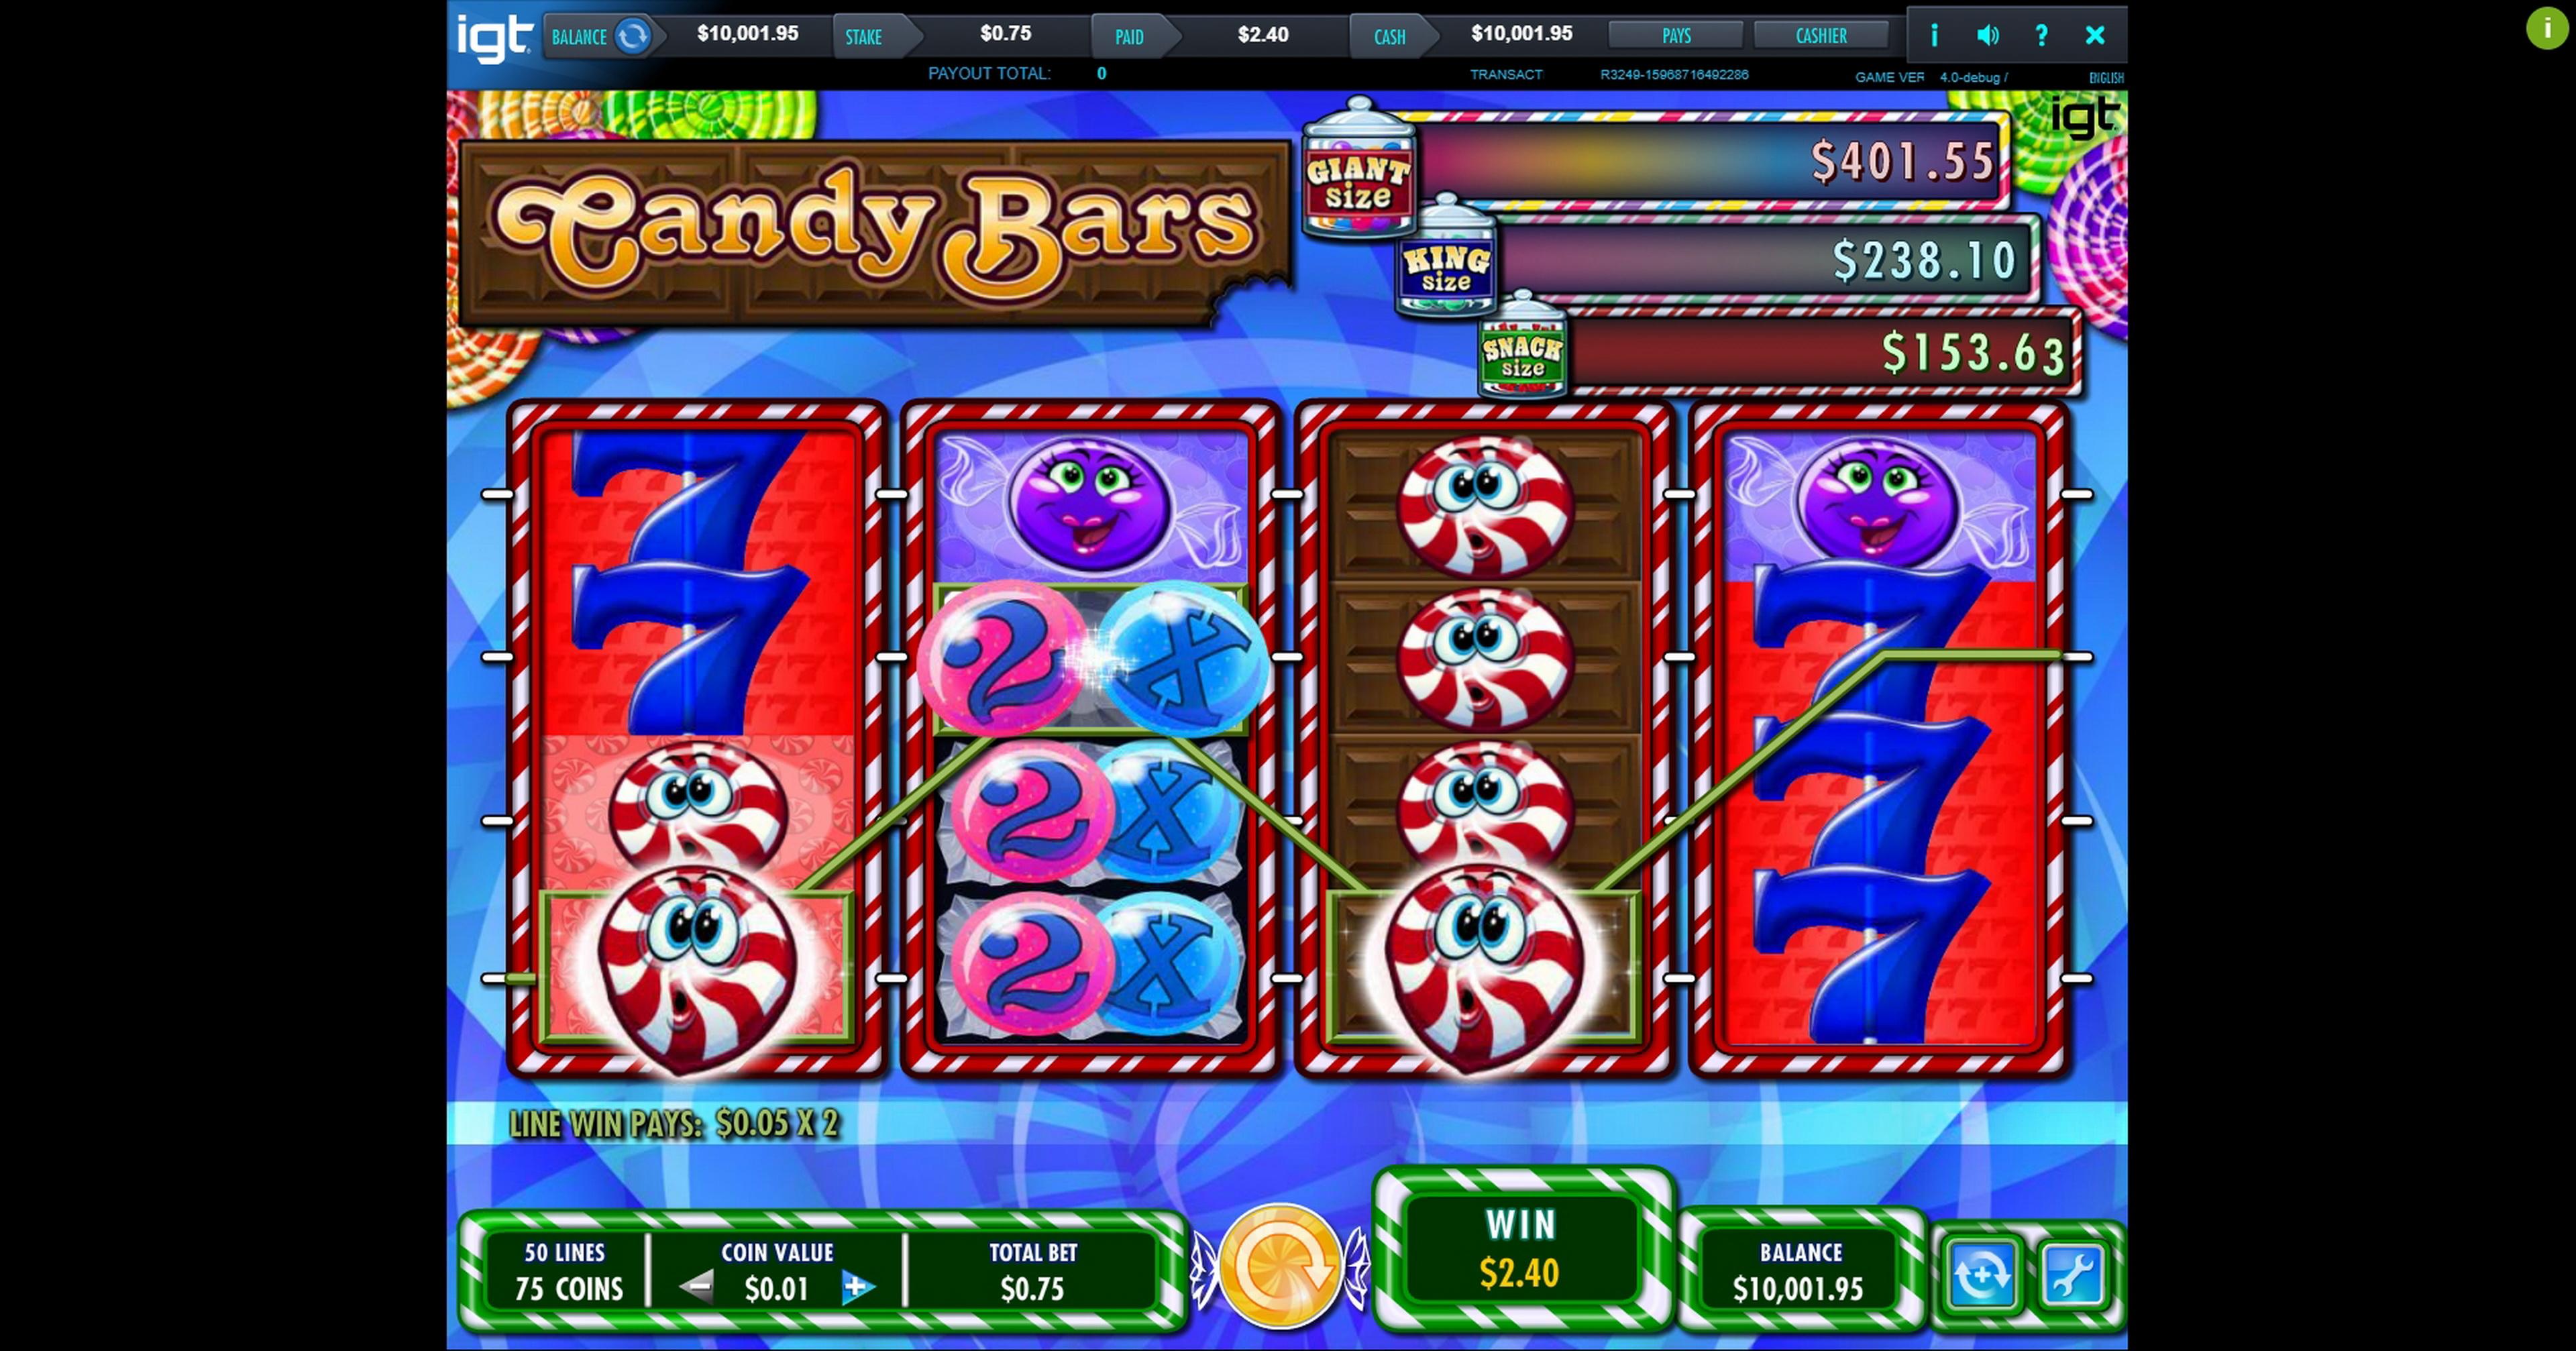 Candy Dreams Slot Machine Demo No Download